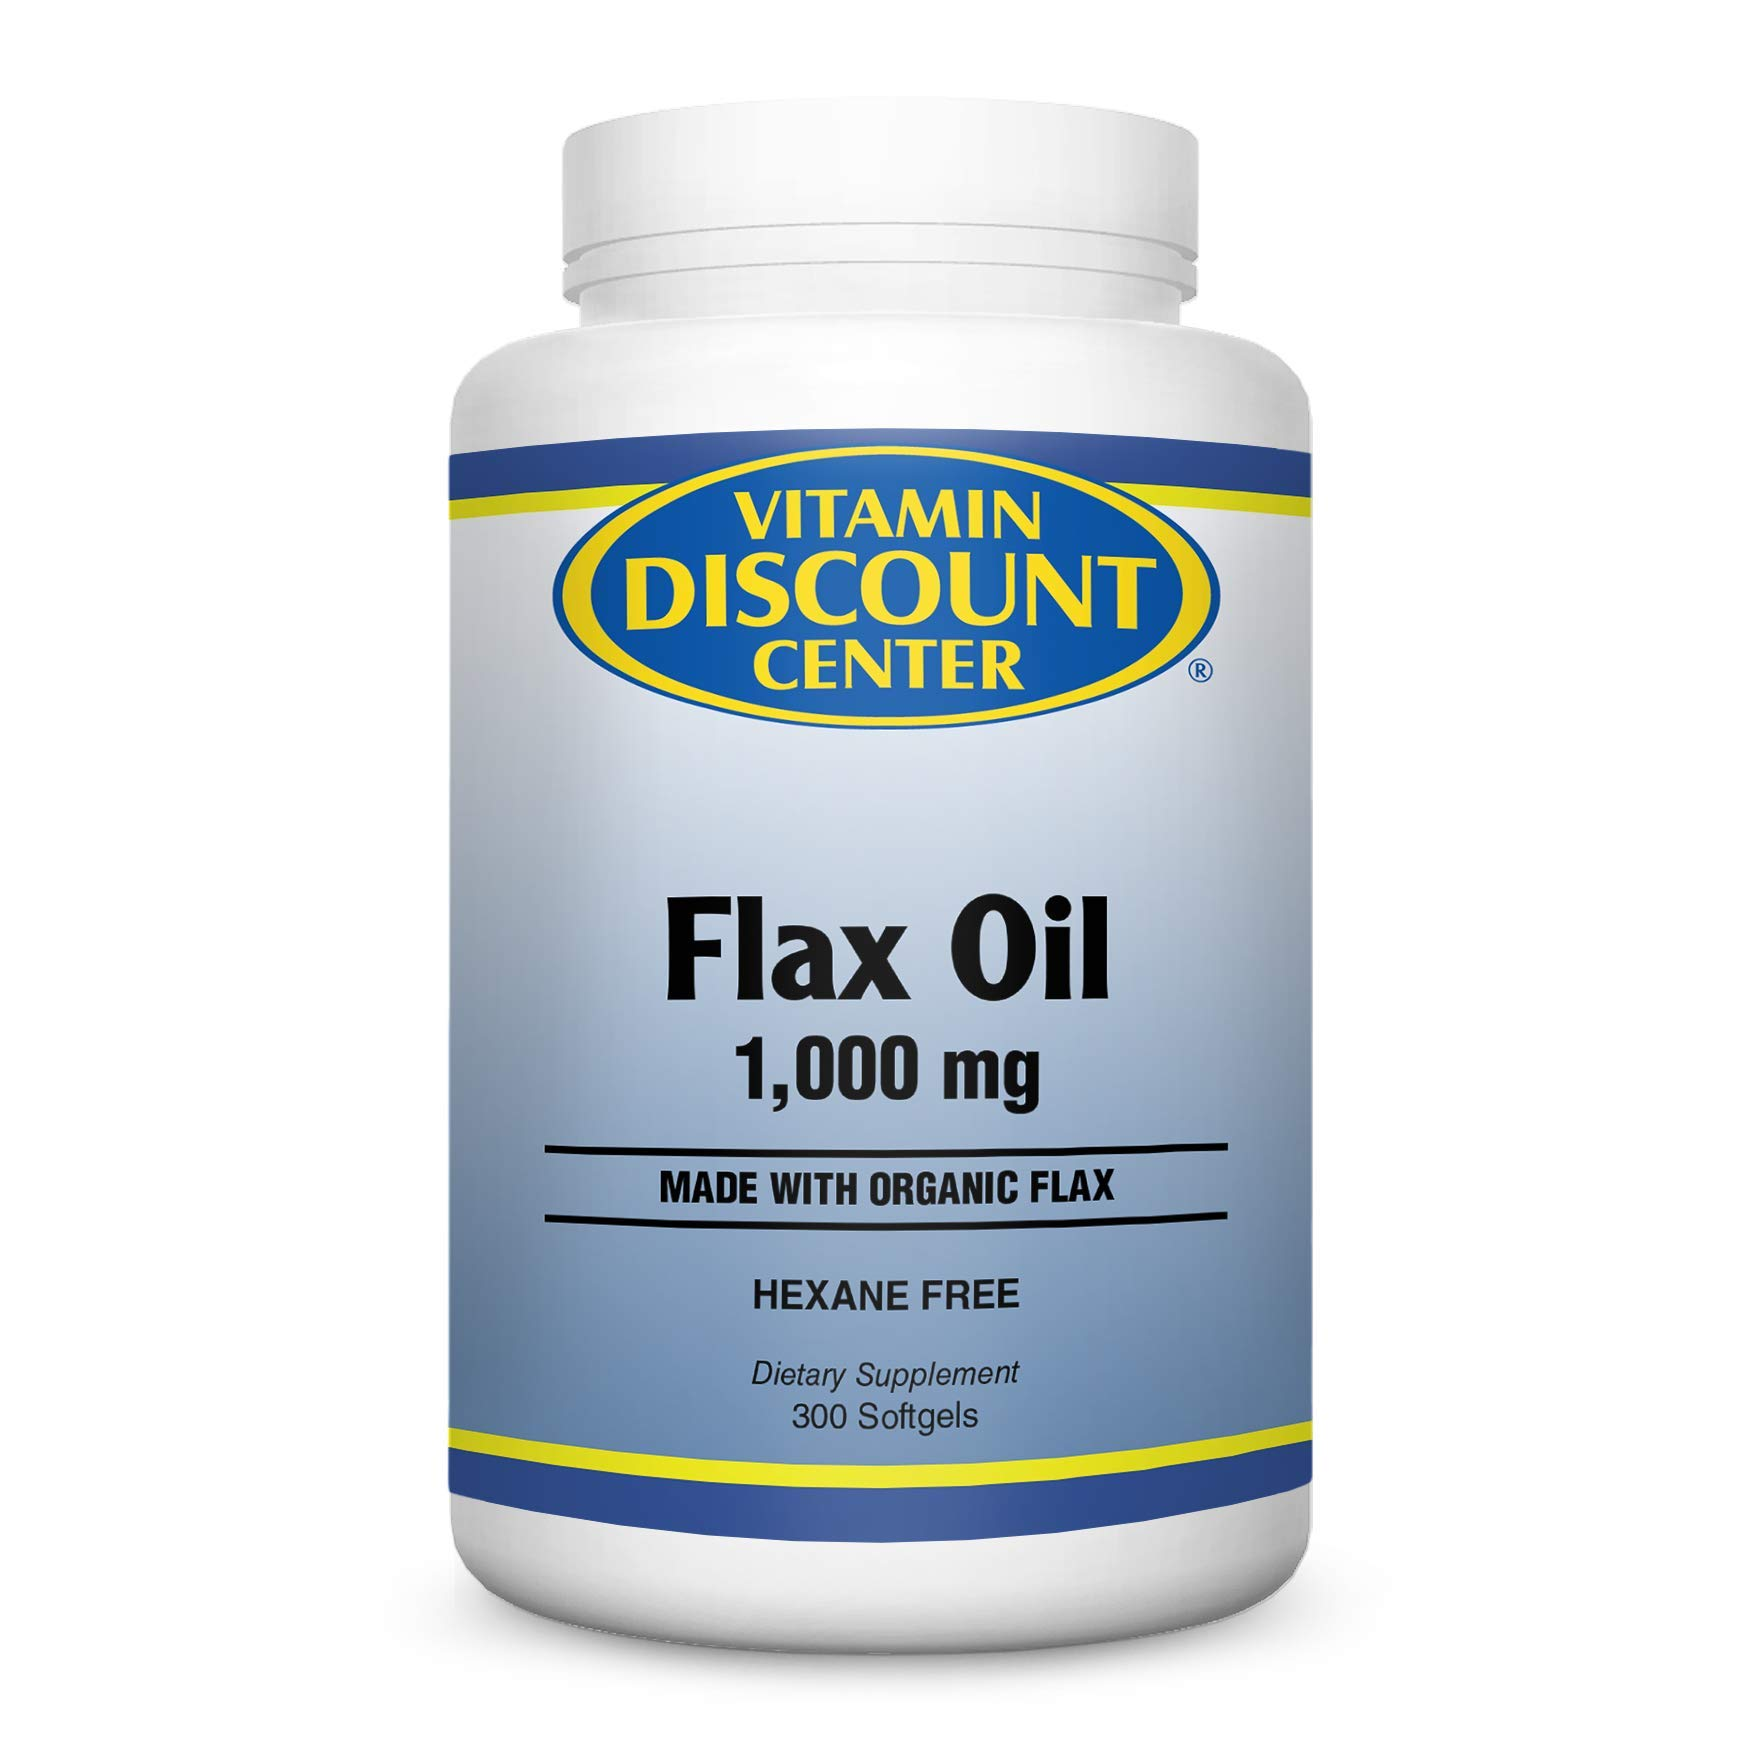 Vitamin Discount Center Organic Flax Oil 1000mg, 300 Softgels by Vitamin Discount Center